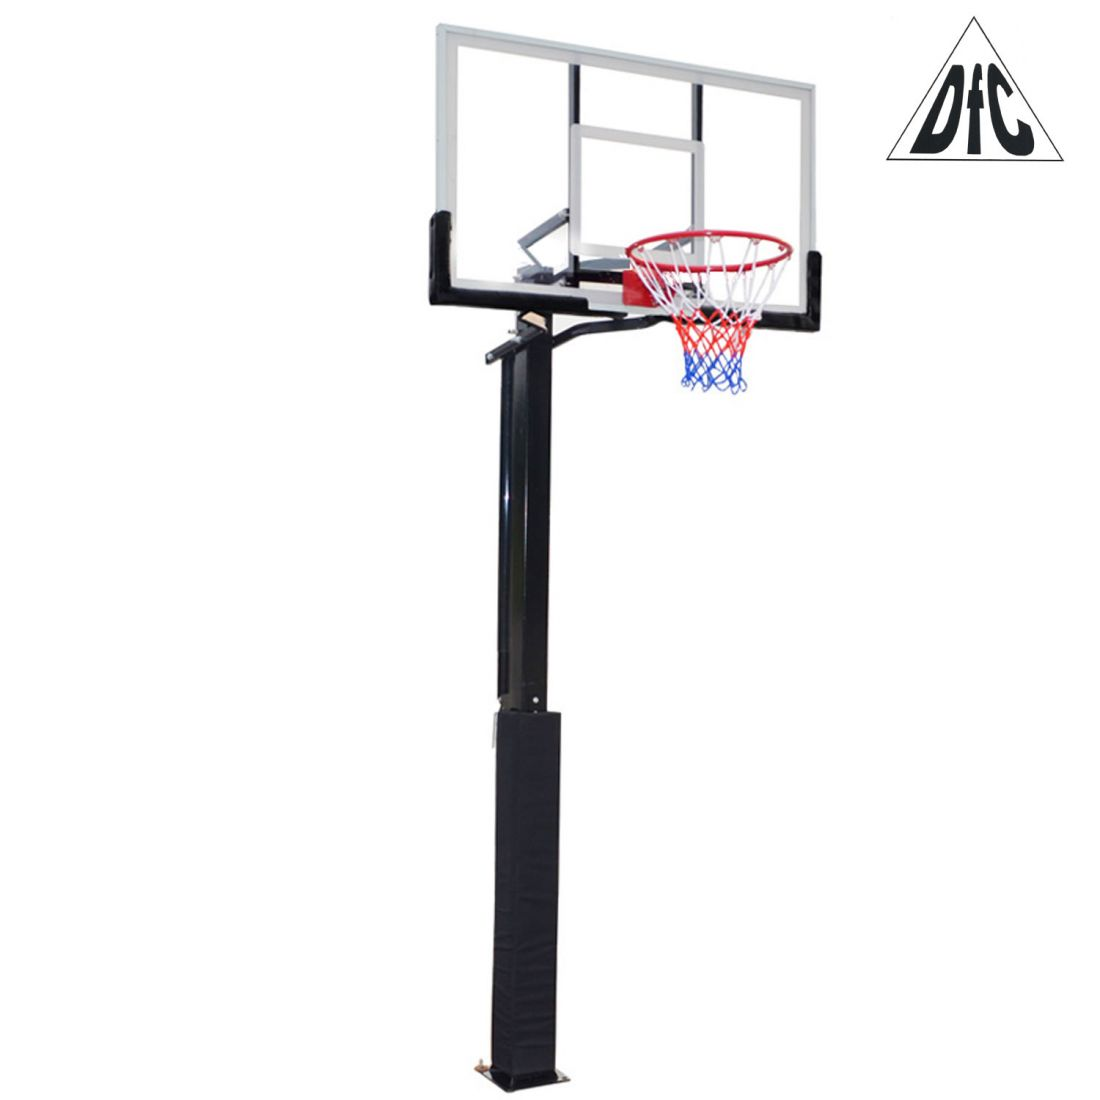 Стационарная баскетбольная стойка - DFC ING50A